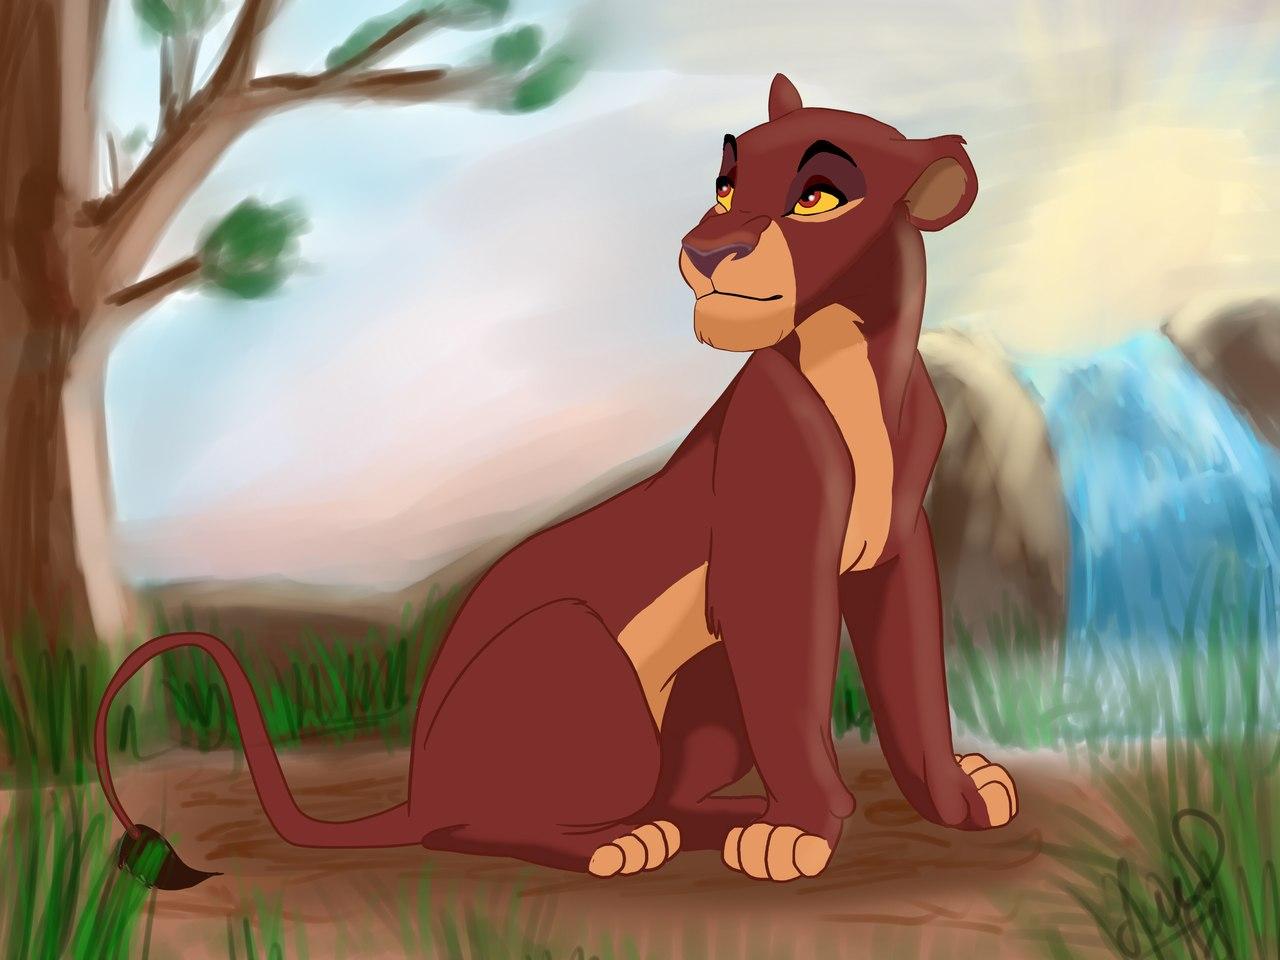 Порно король лев симба и шрам